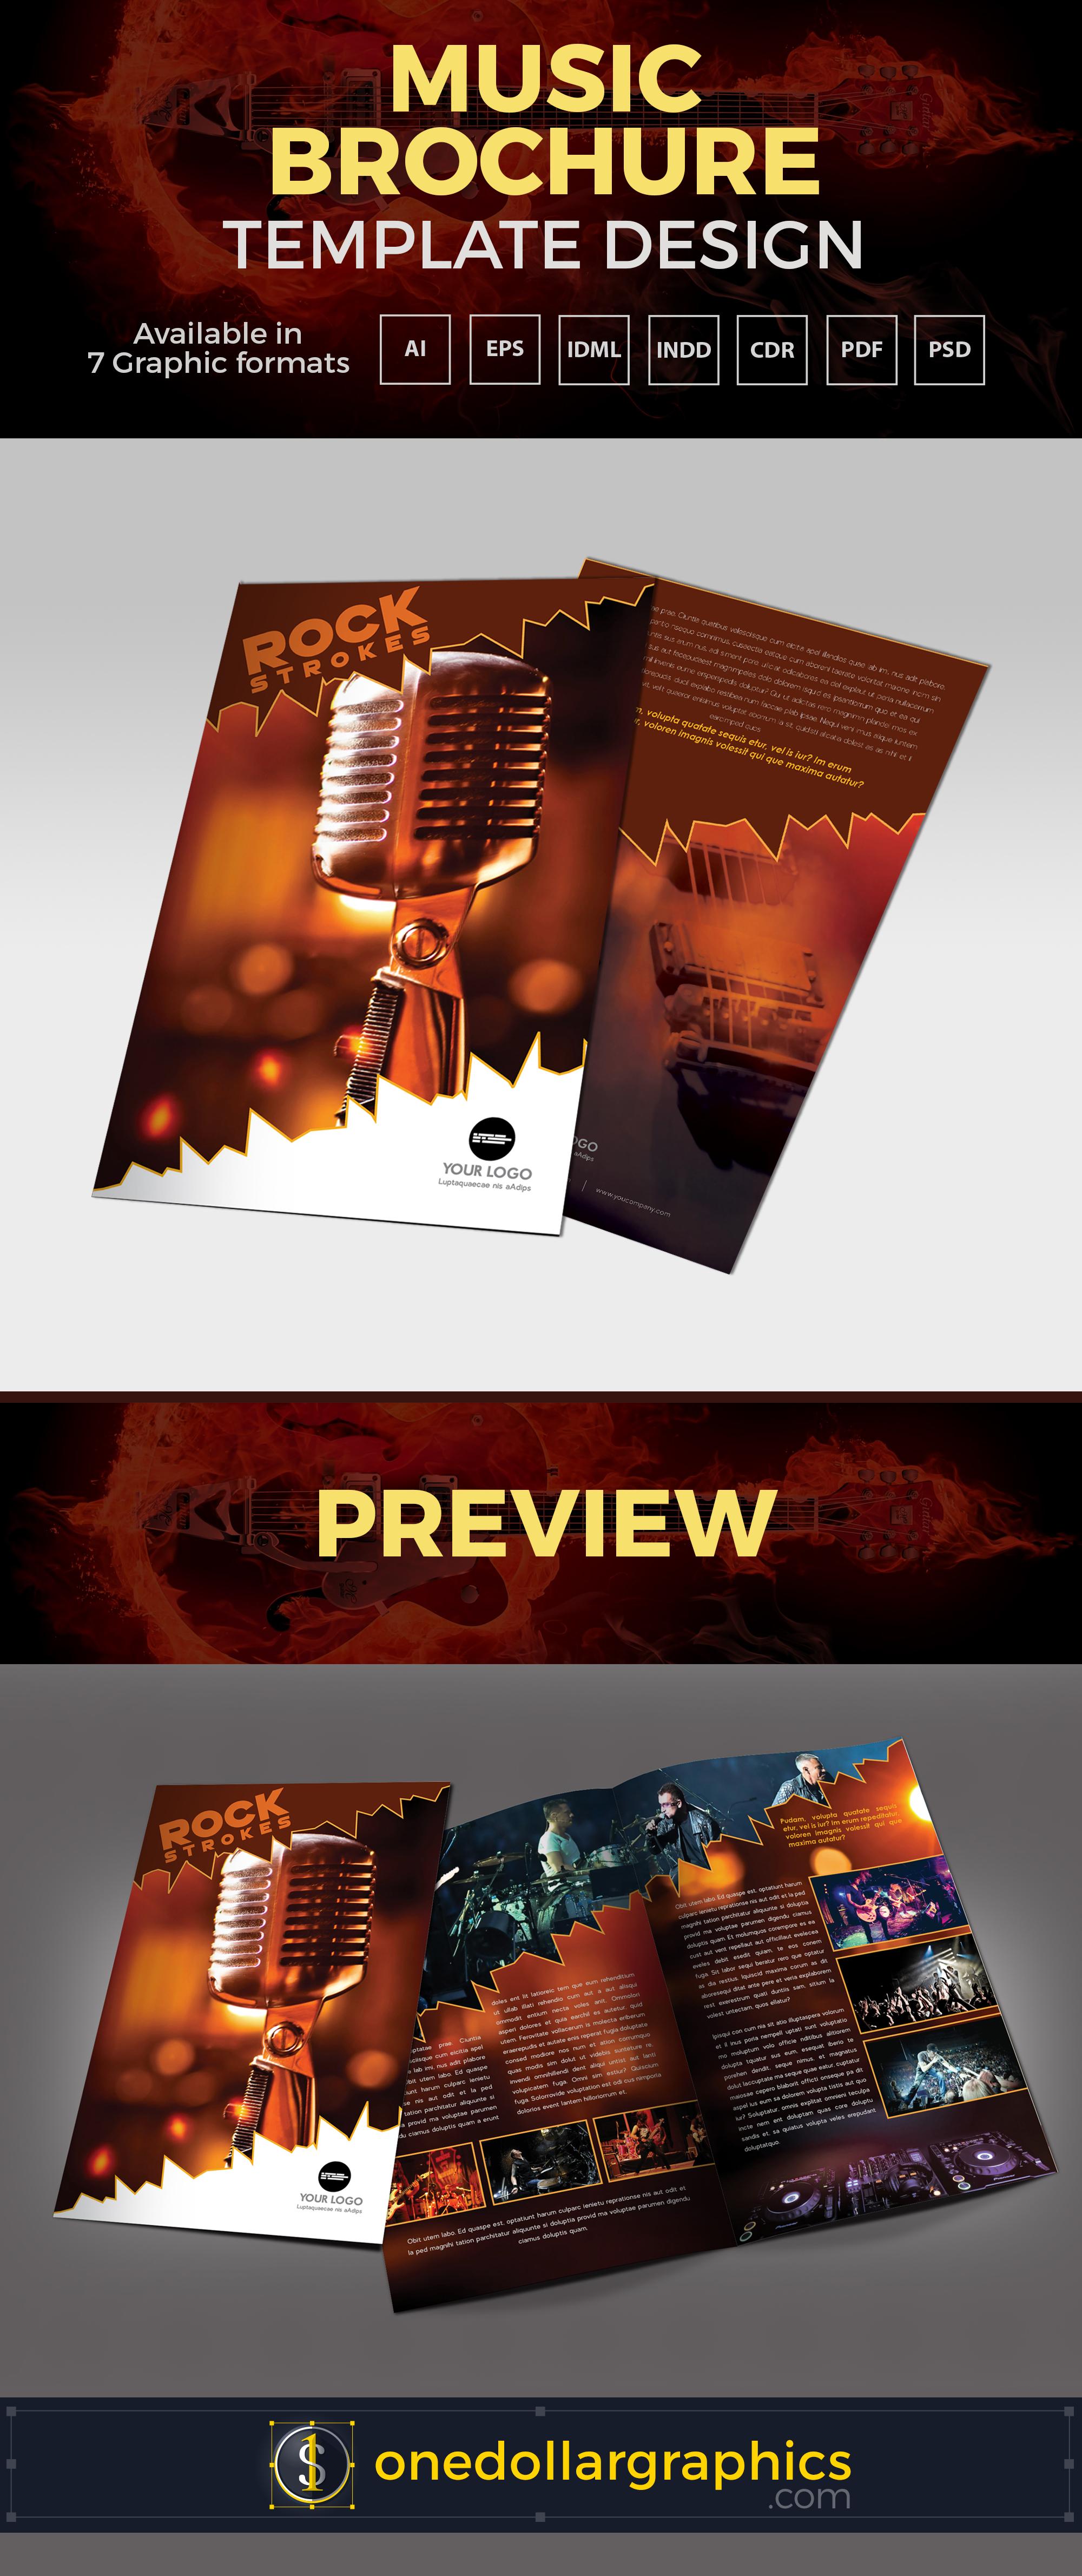 A4 Music-brochure-template-design